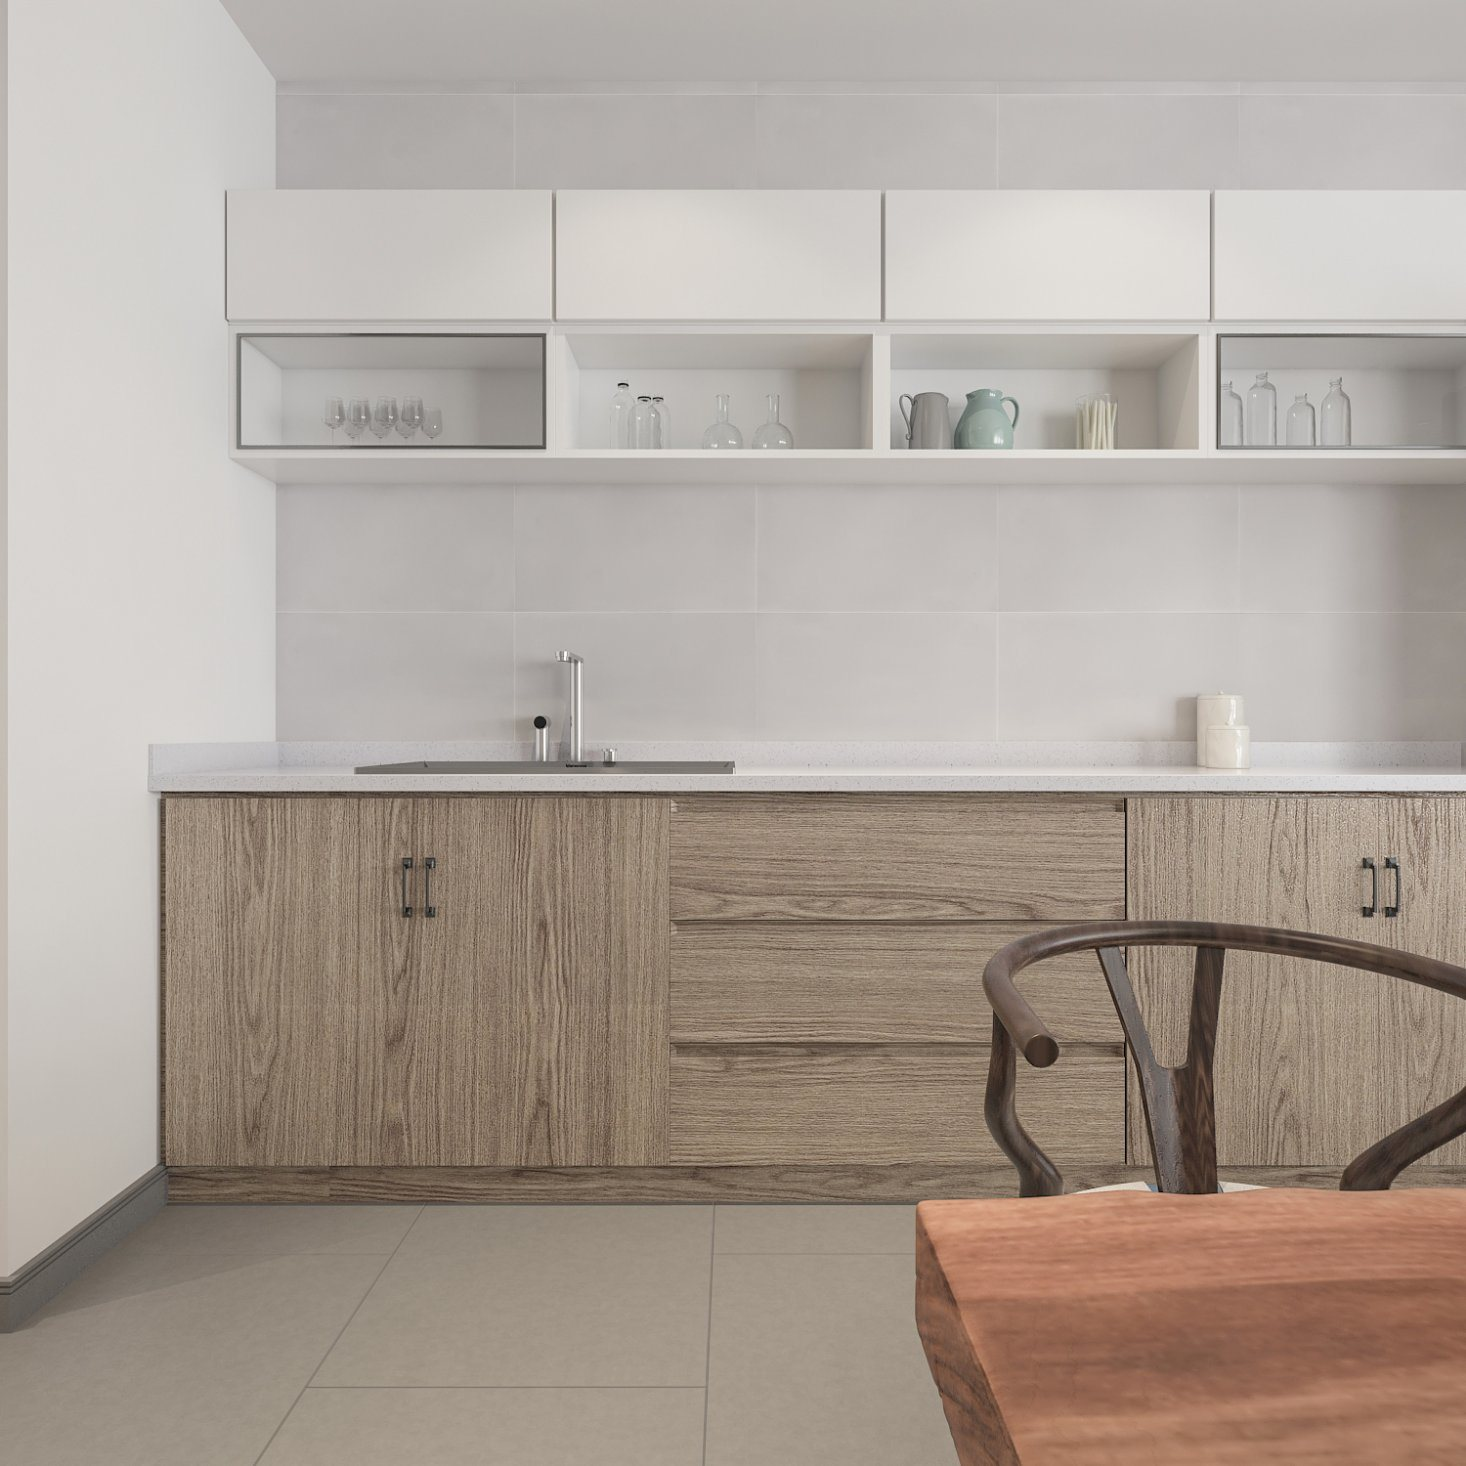 - China Rectangular Ceramic 30X60cm Modern White Tile Backsplash